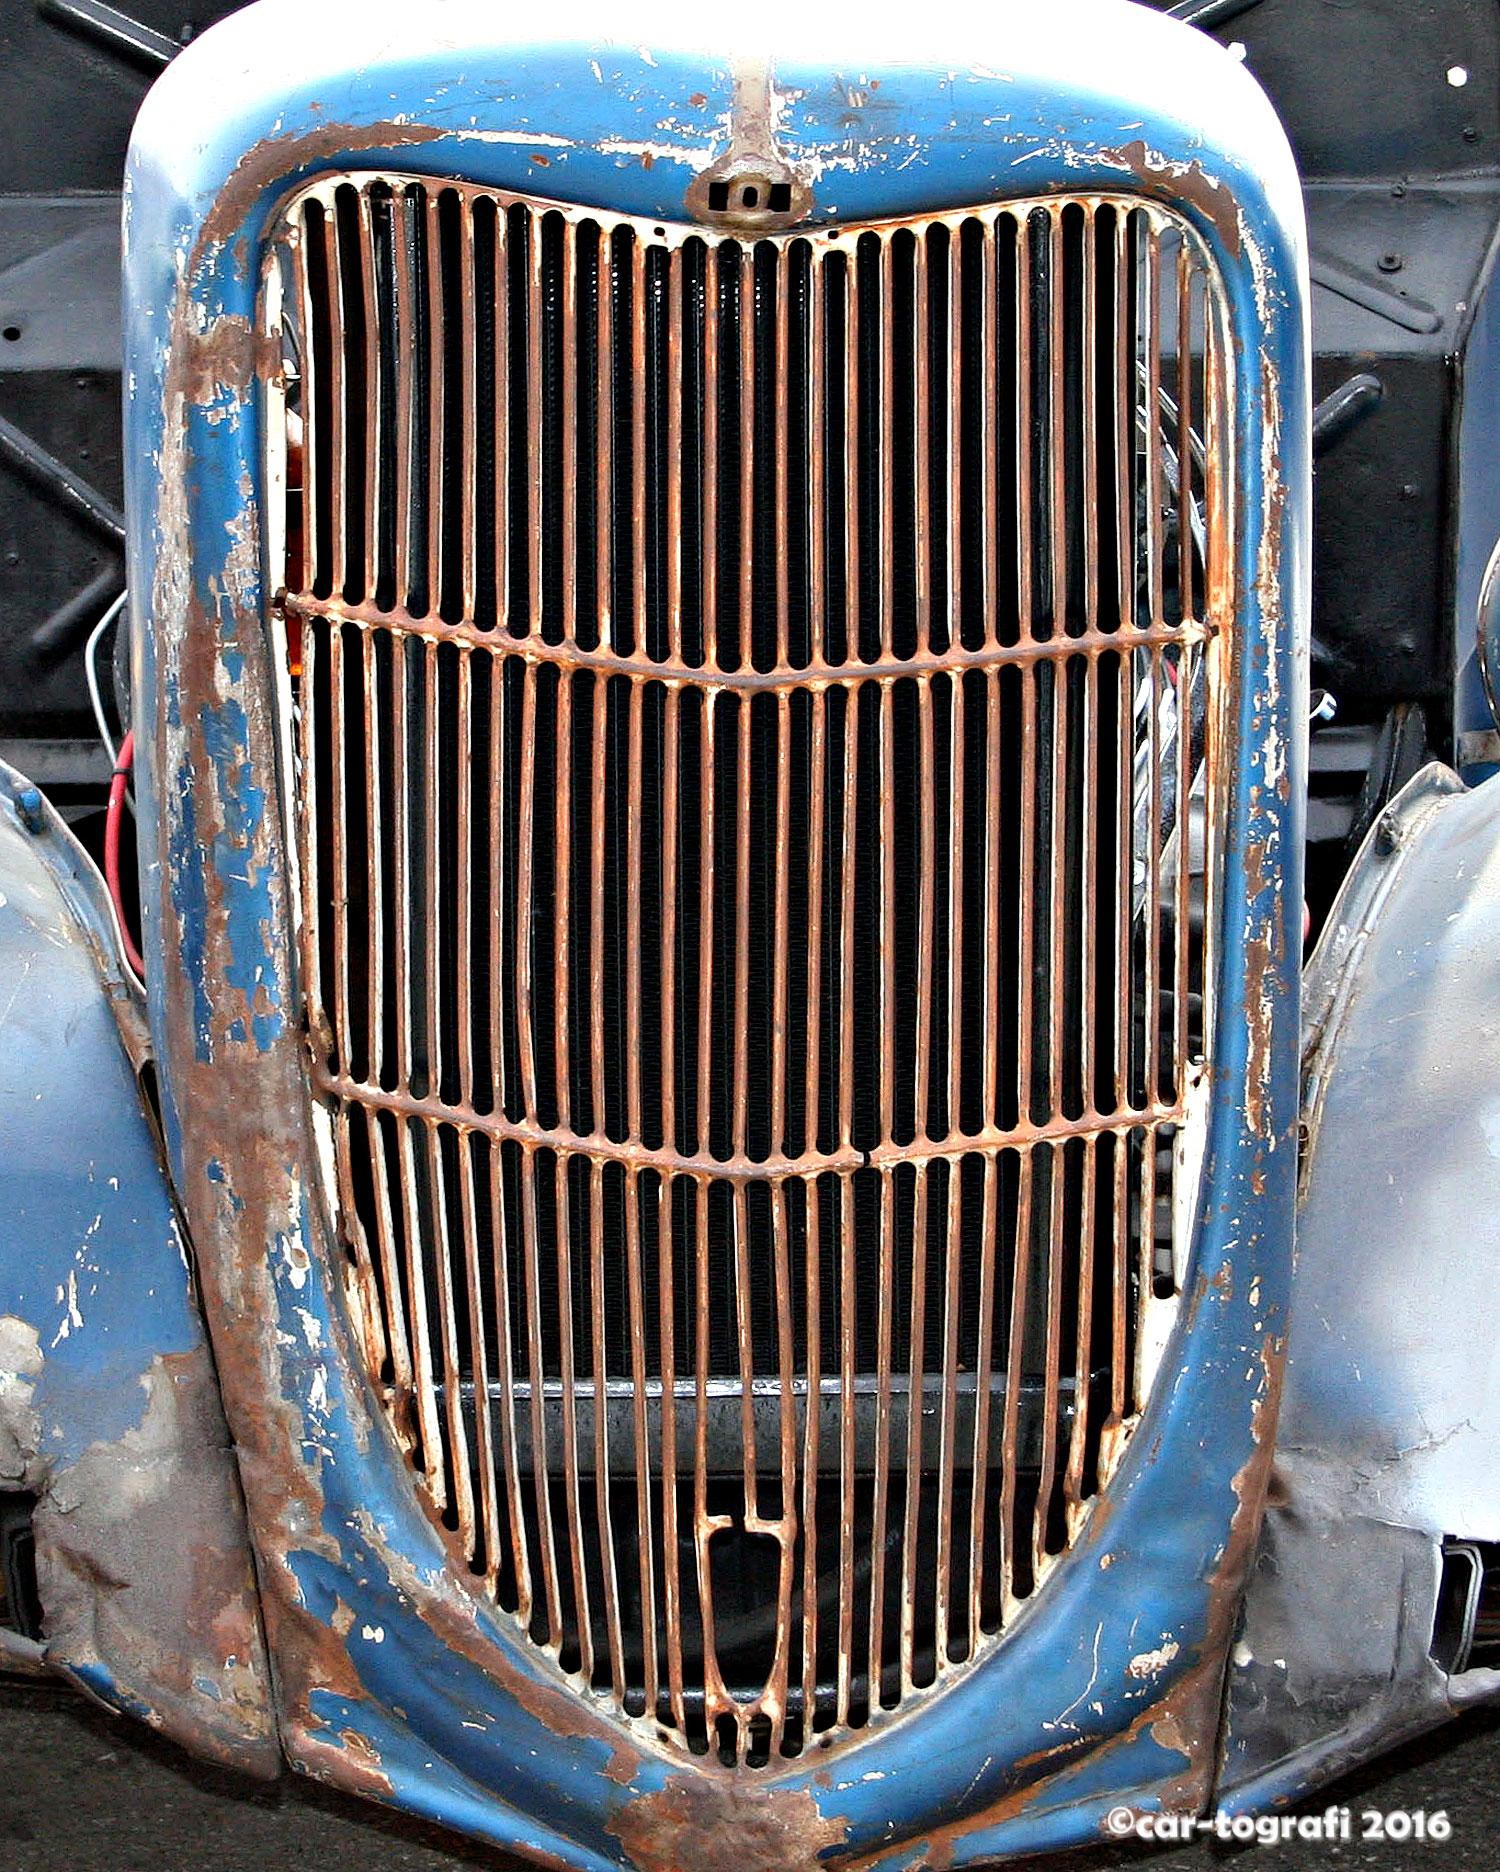 rusted-in-blue-car-tografi.jpg